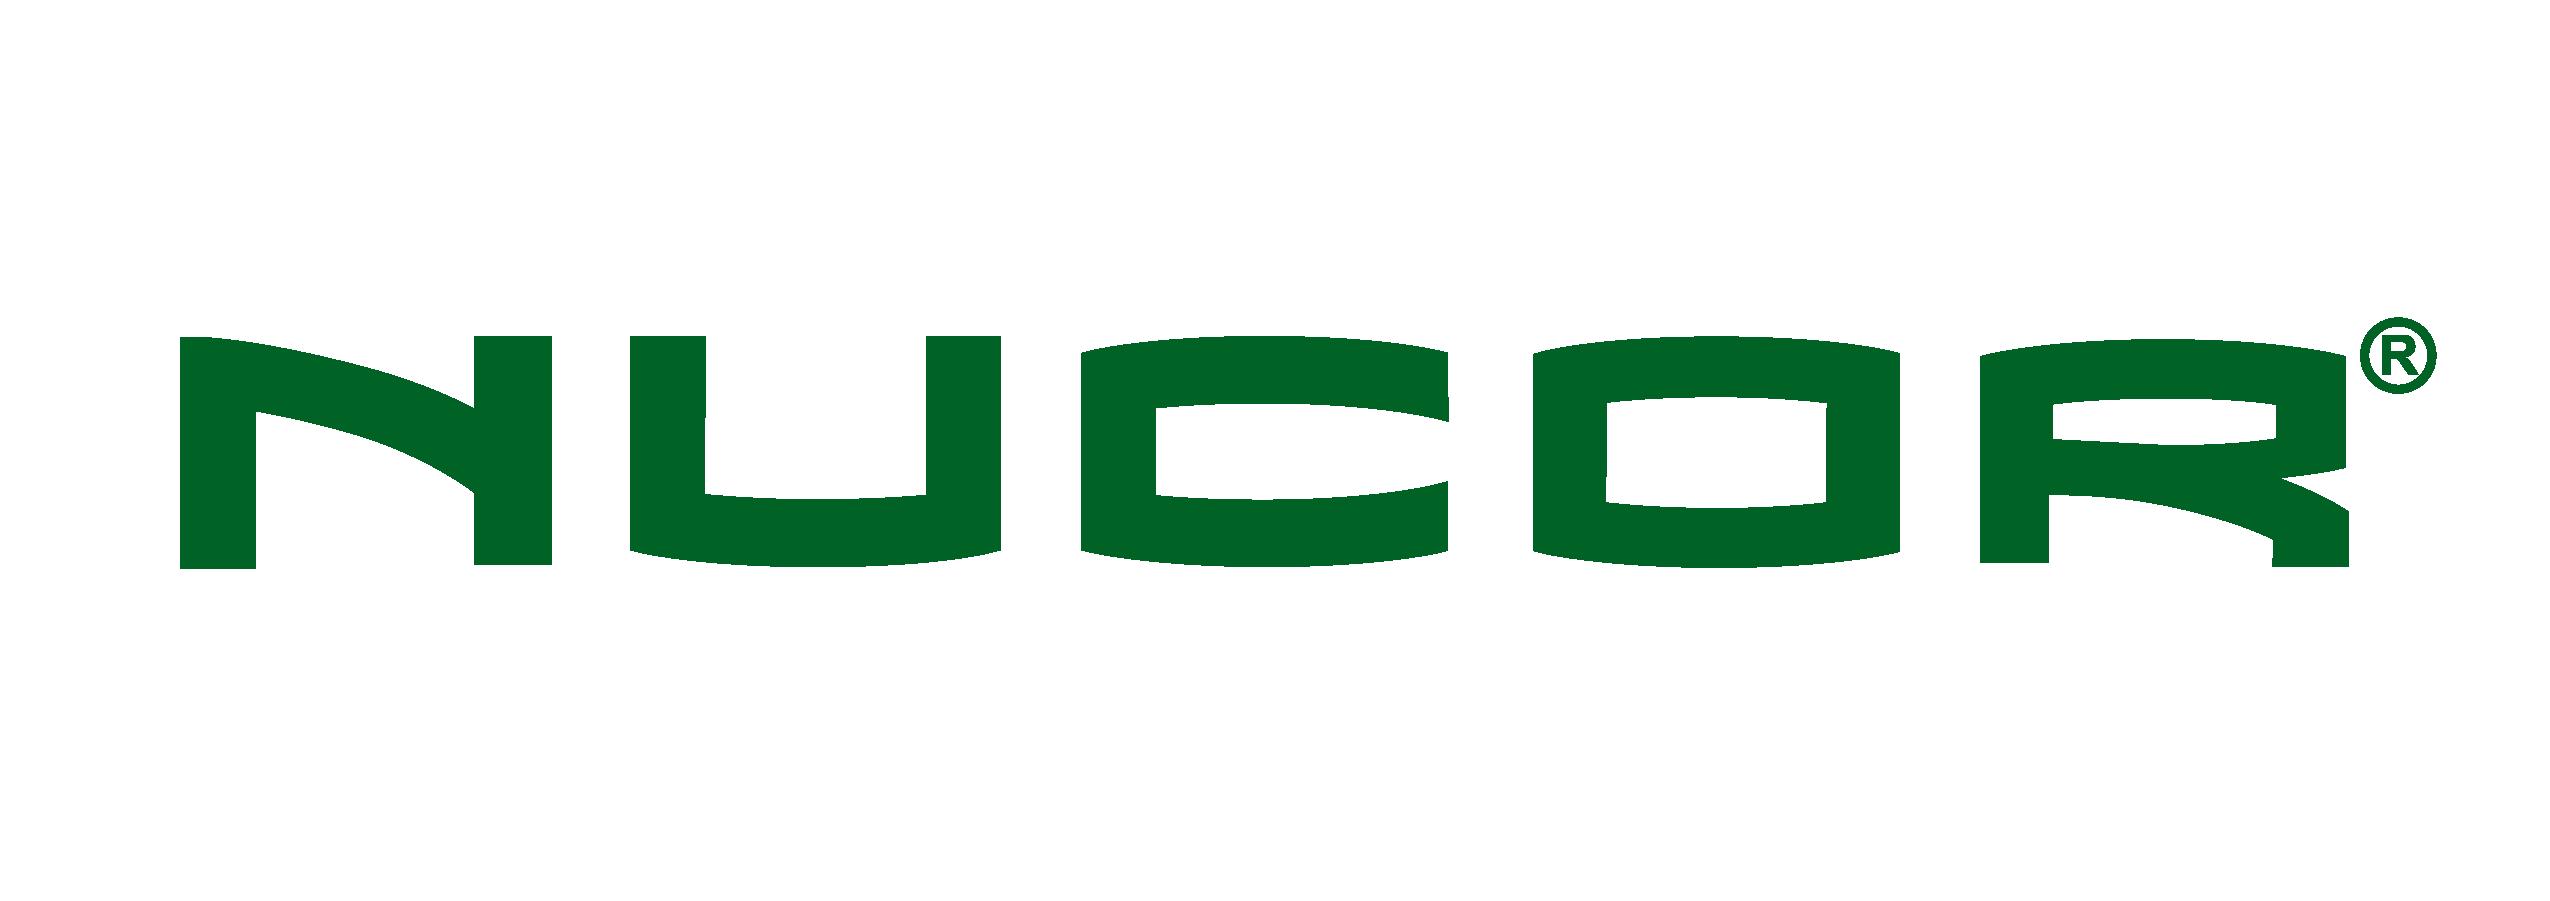 Nucor_Green_For_Web_RGB_transparent